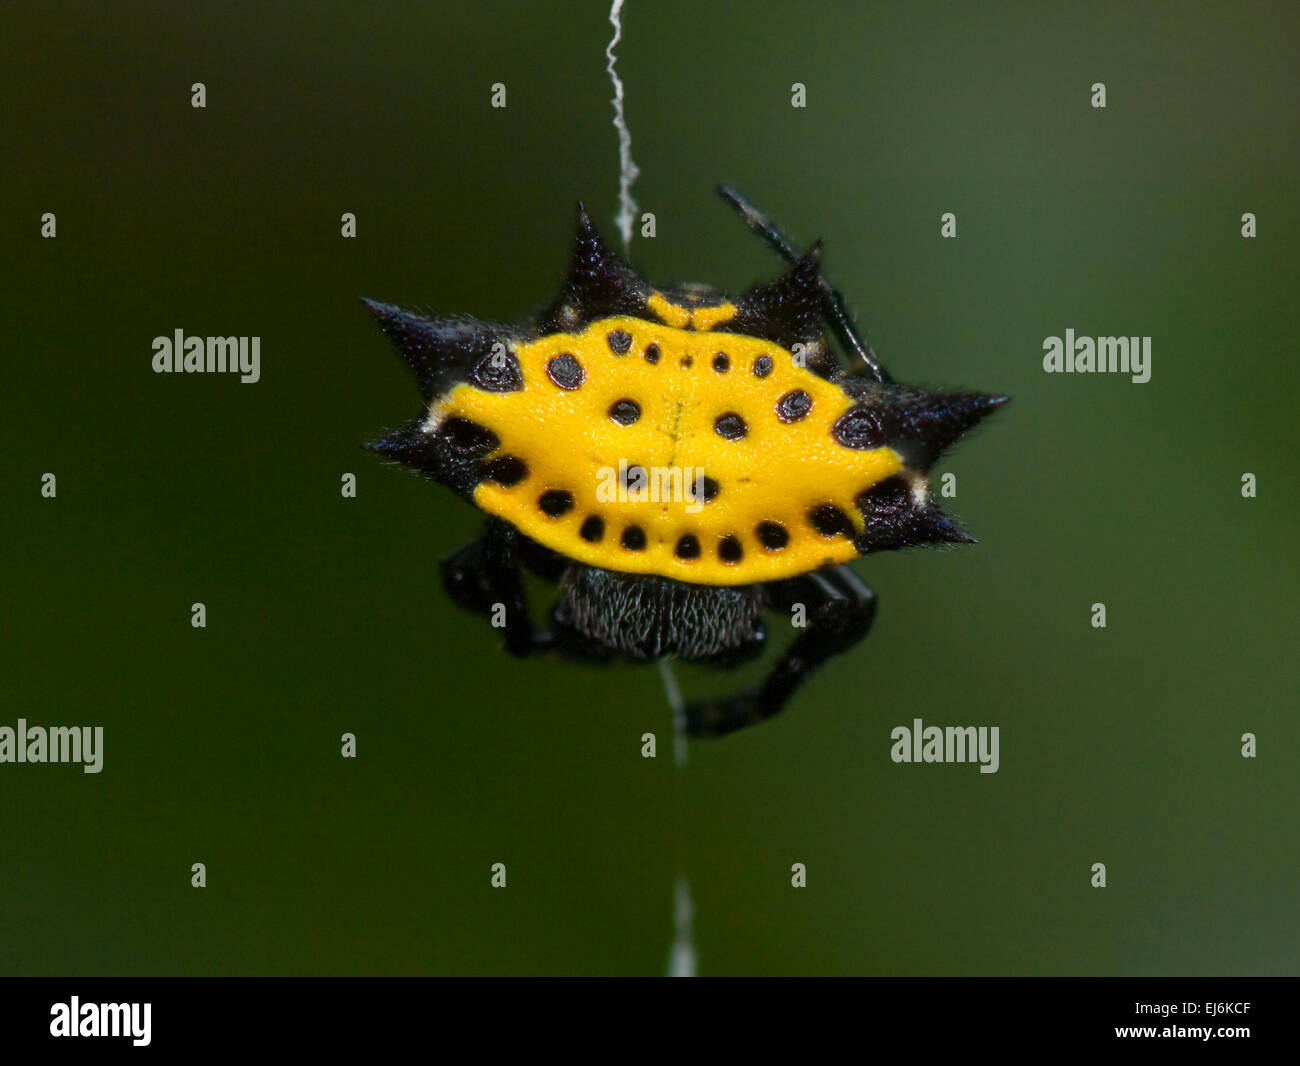 crablike-spiny-orb-weaver-gasteracantha-